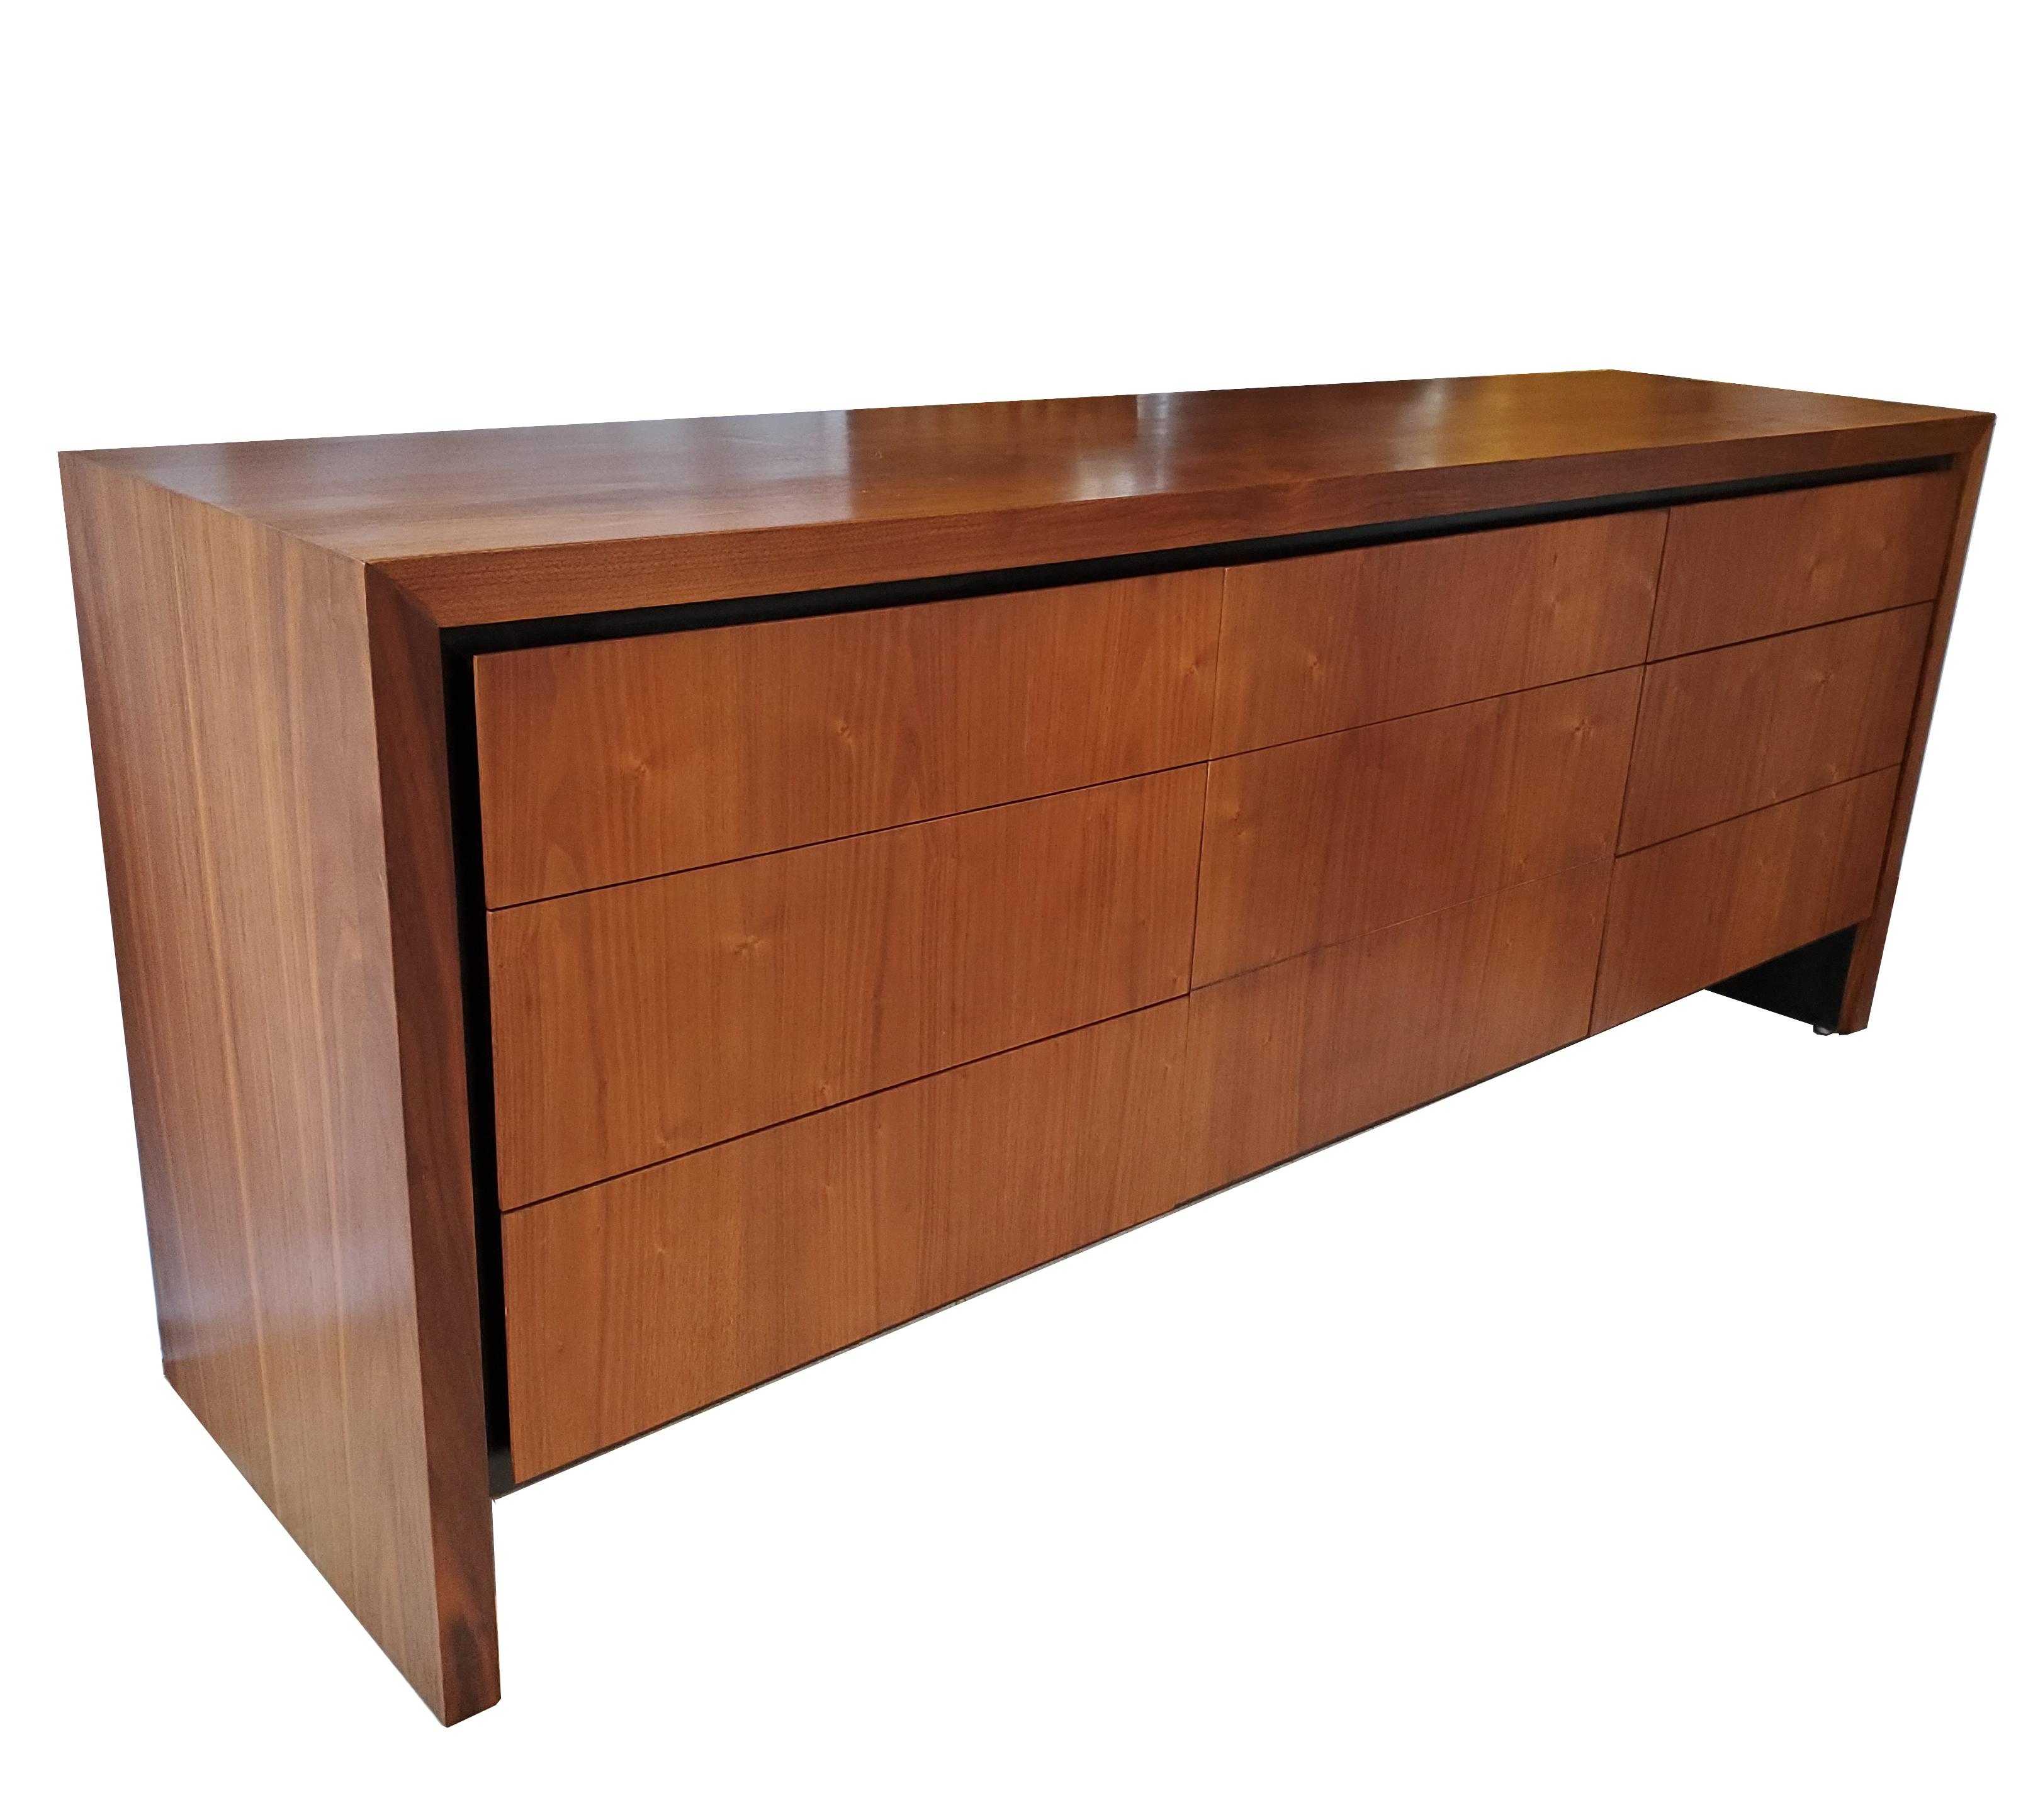 milo-baughman-dresser-lg.jpg